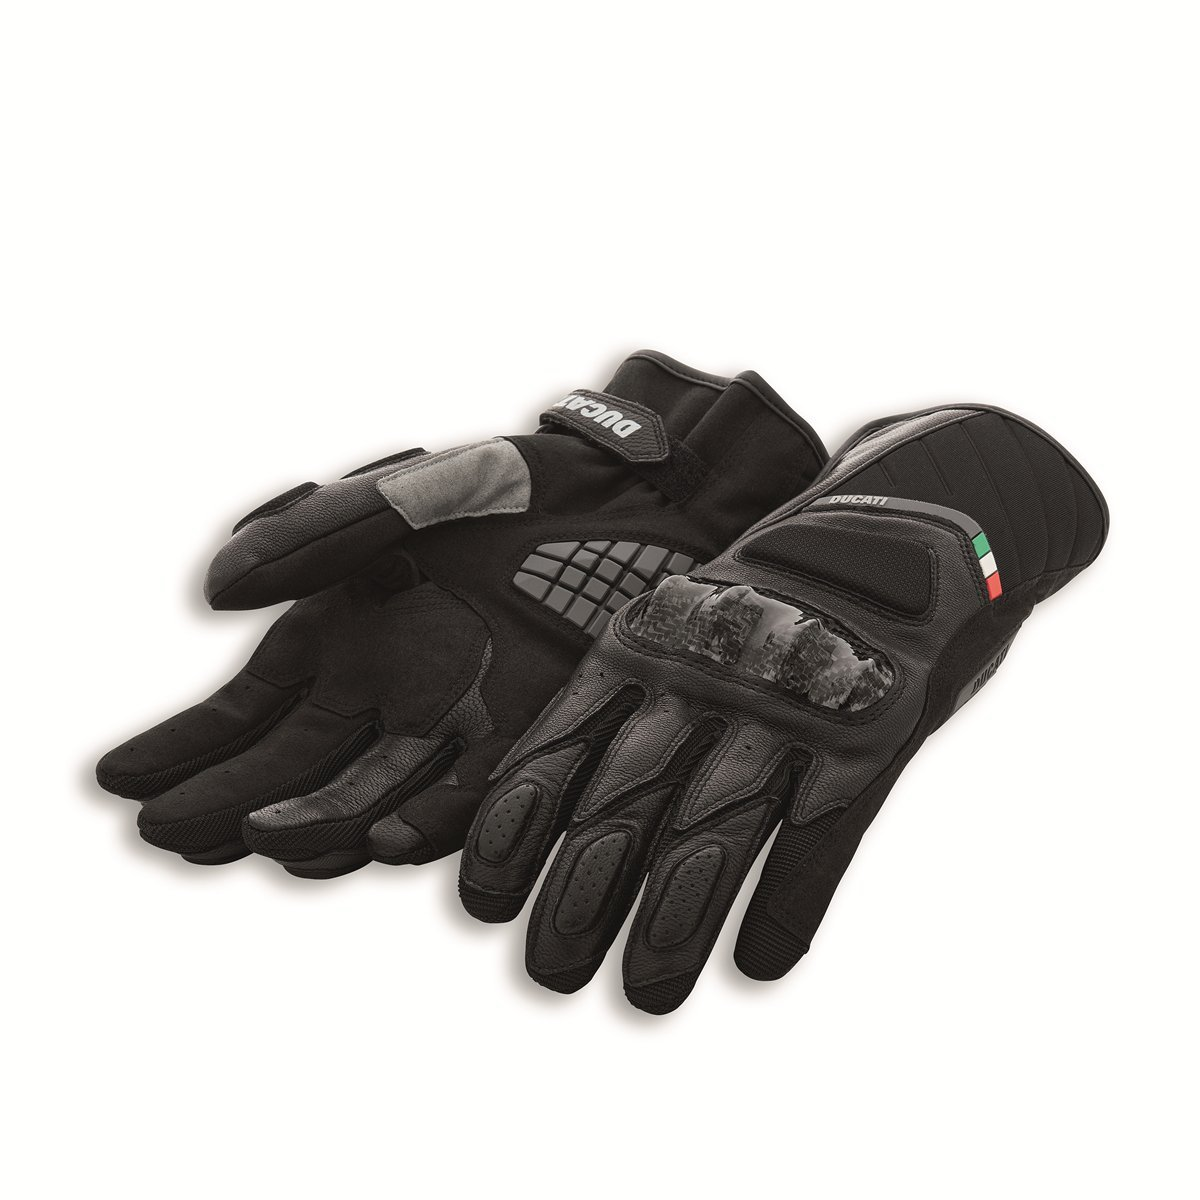 Ducati Sport C3 Leather-fabric gloves 9810370 (L, Black)